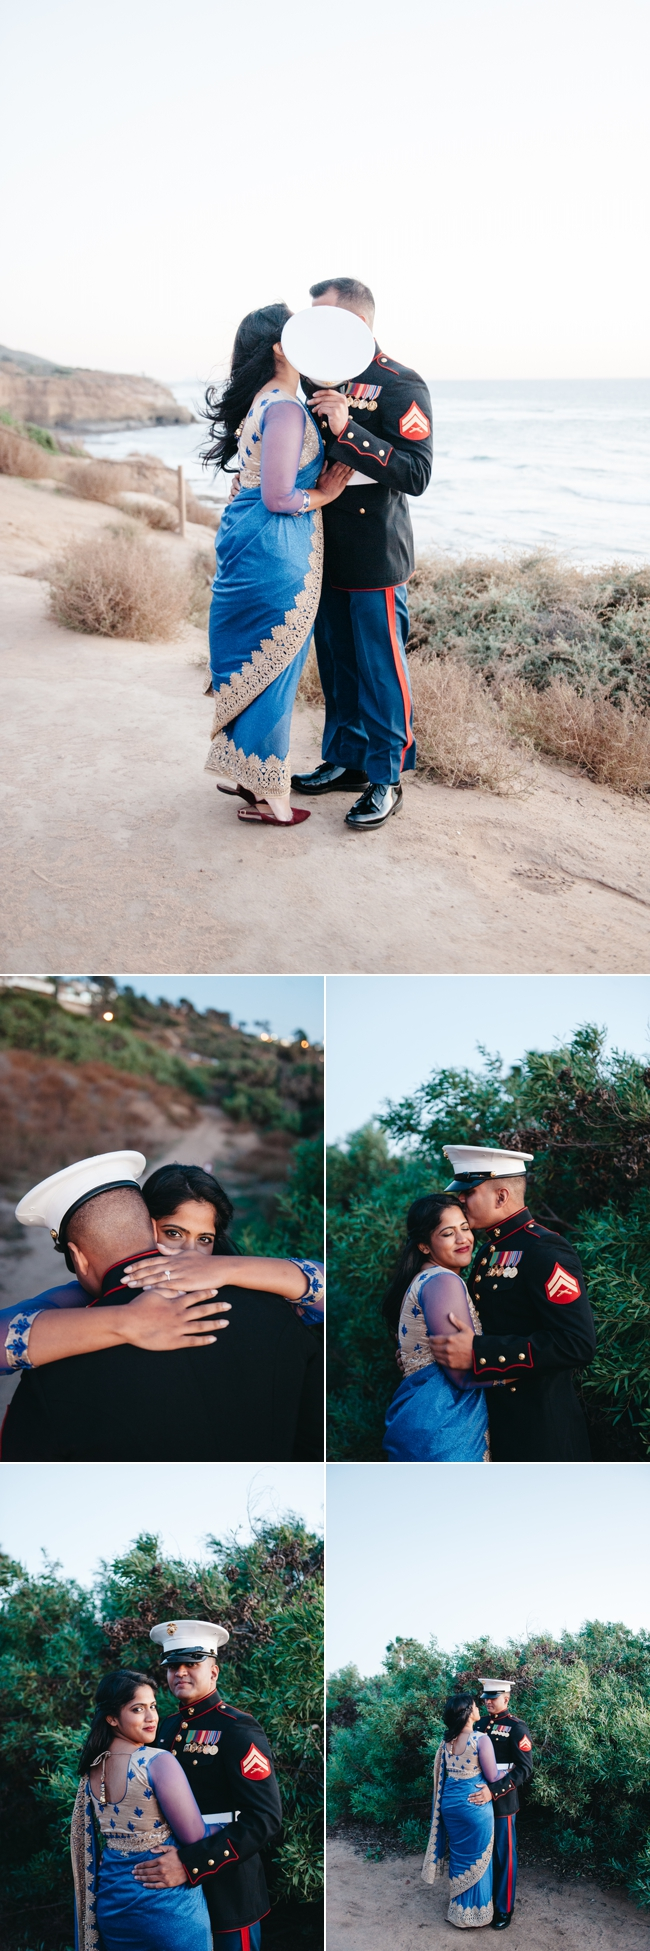 destination-wedding-photographers-california 9.jpg